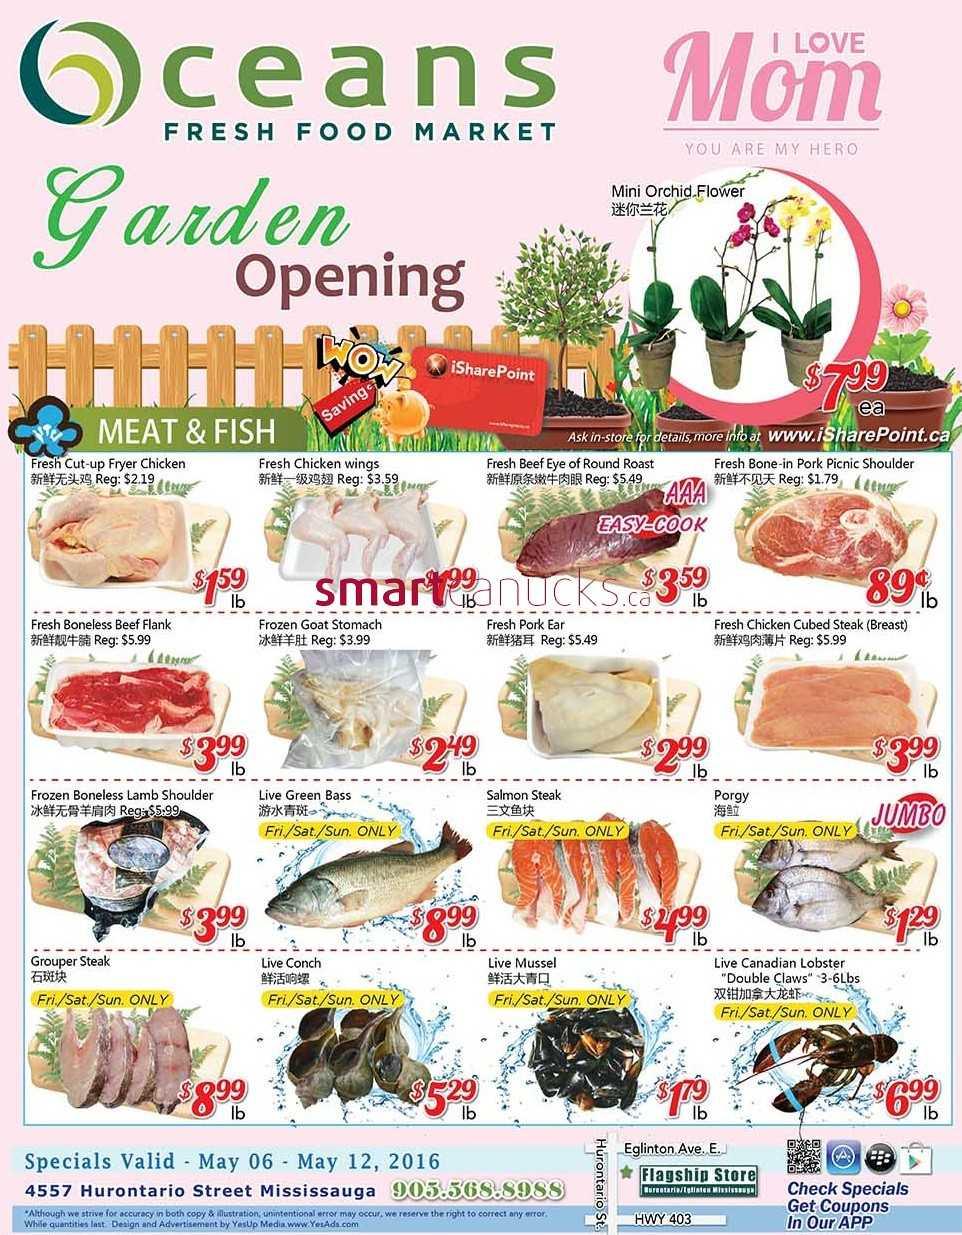 Oceans Fresh Food Market Mississauga Flyer